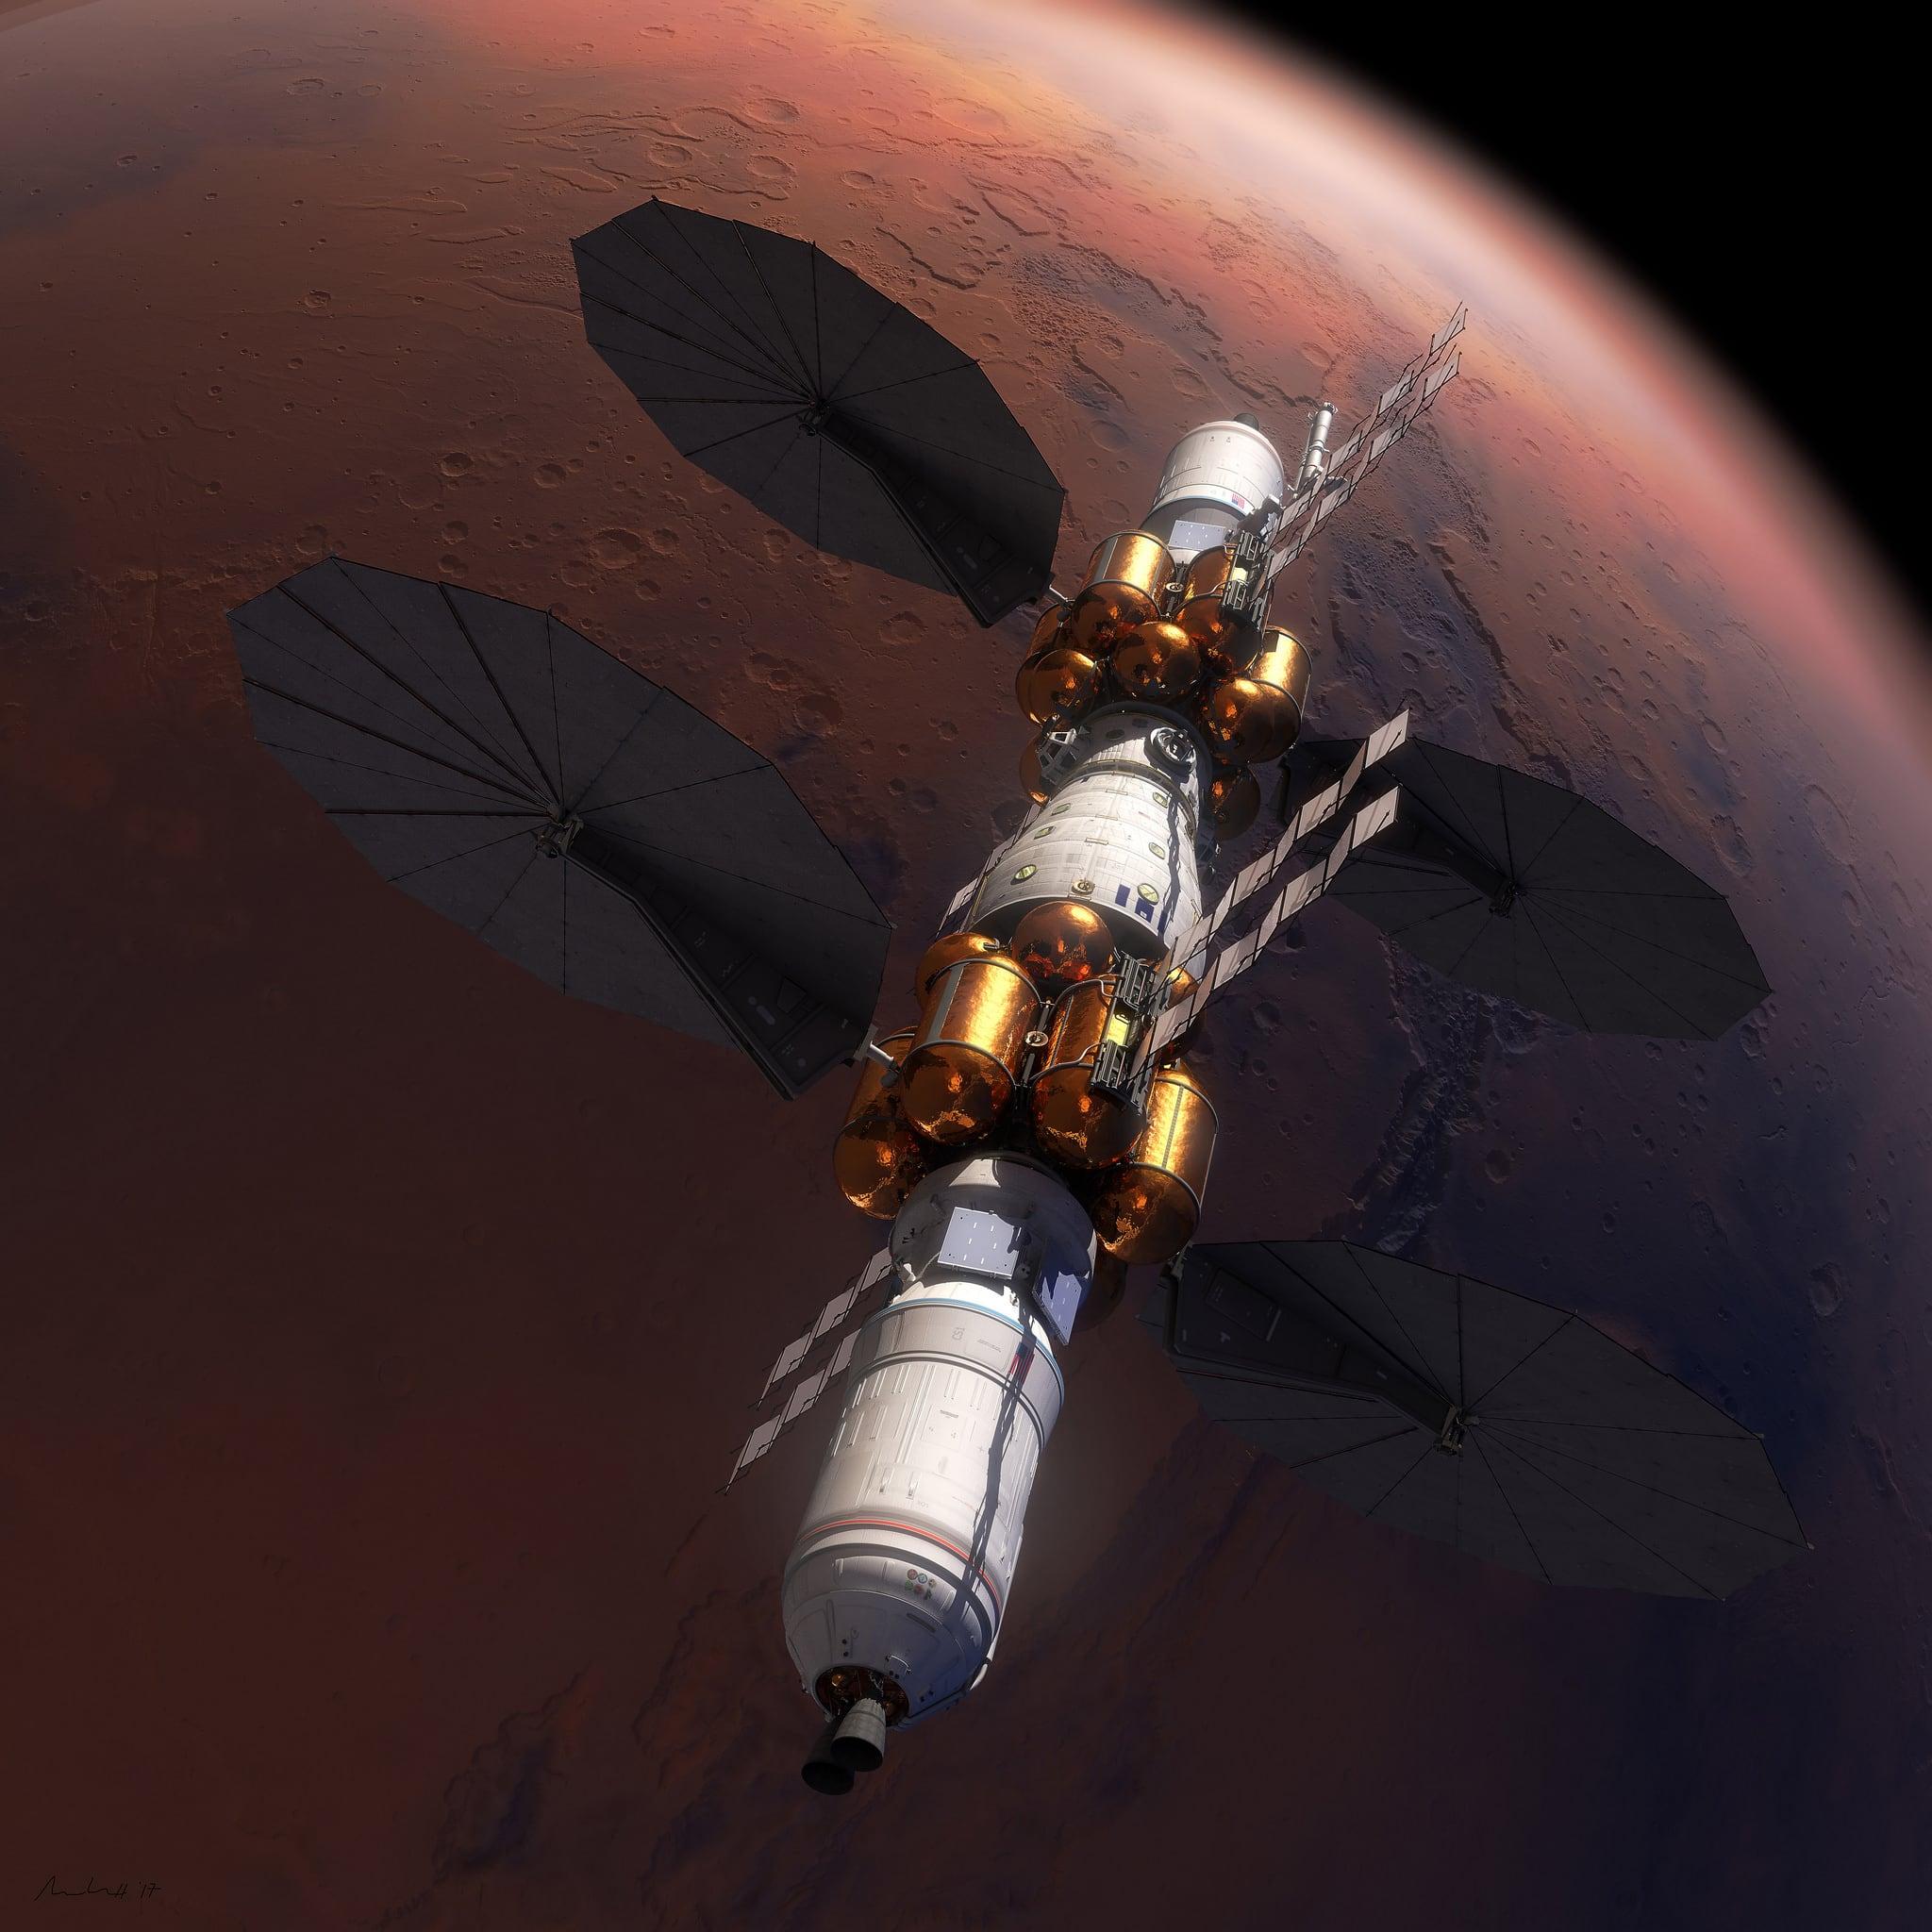 Lockheed Martin reveals Mars landing plans